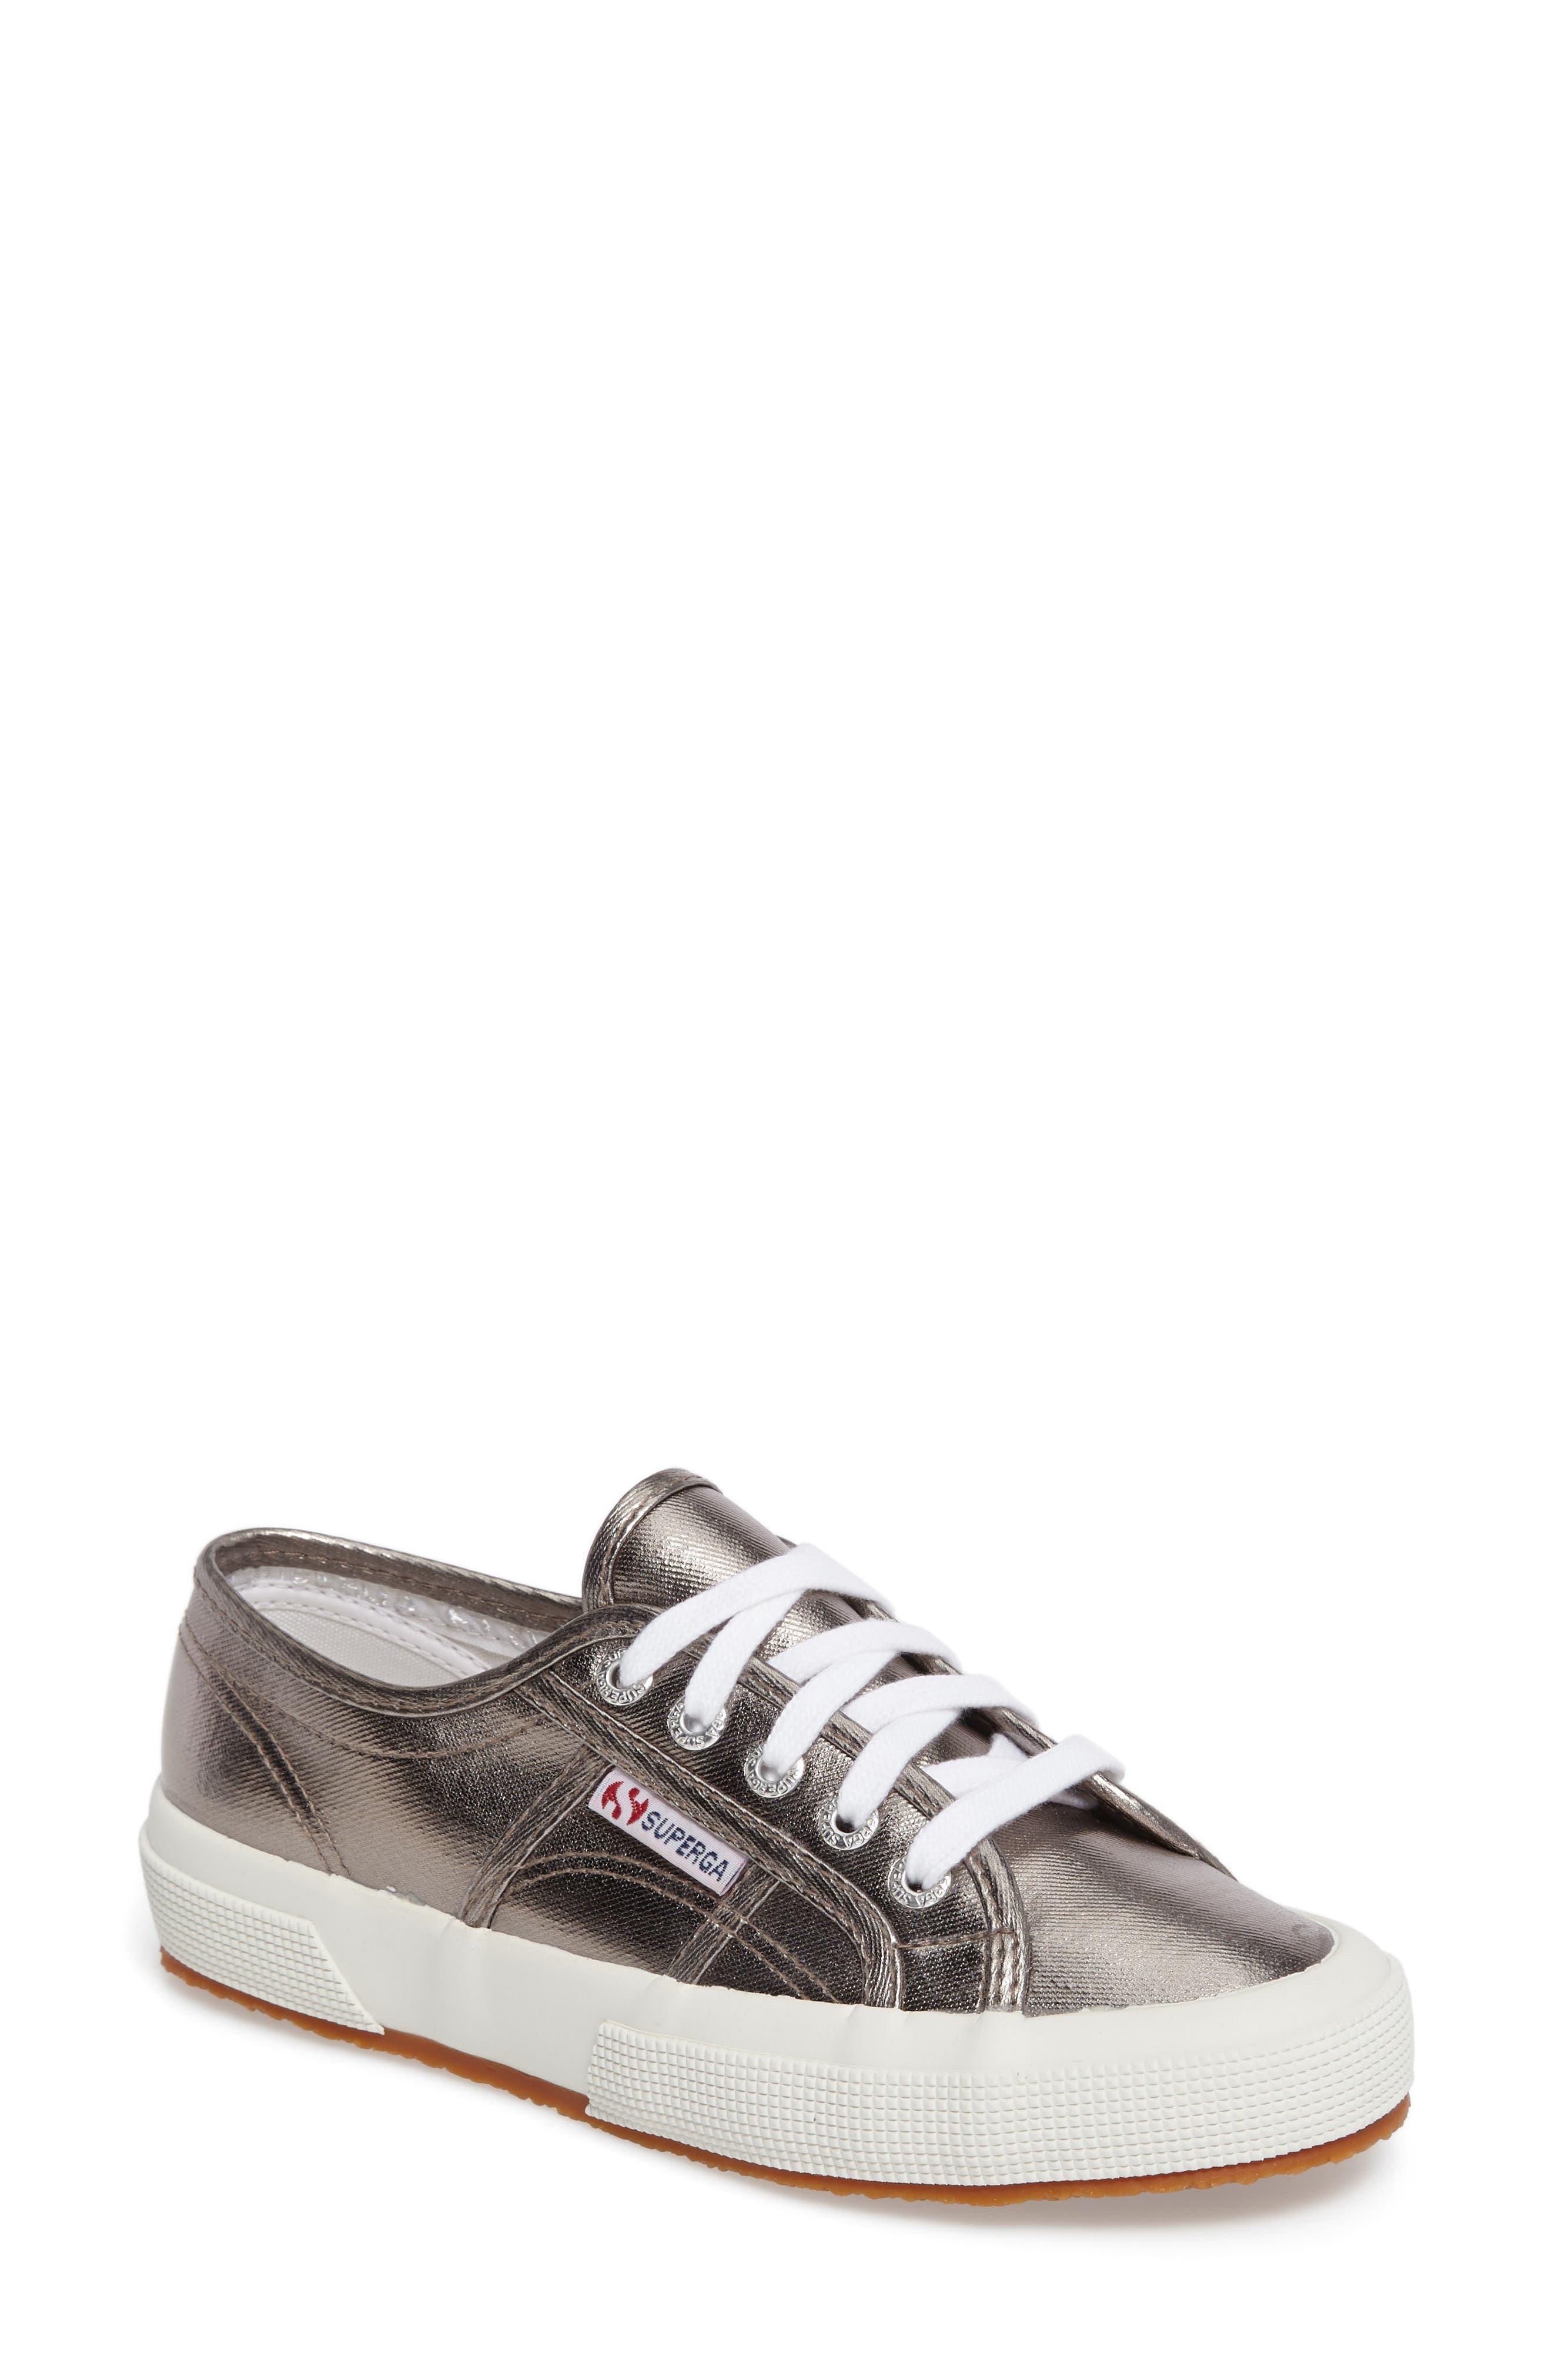 Main Image - Superga 'Cotmetu' Metallic Sneaker (Women)